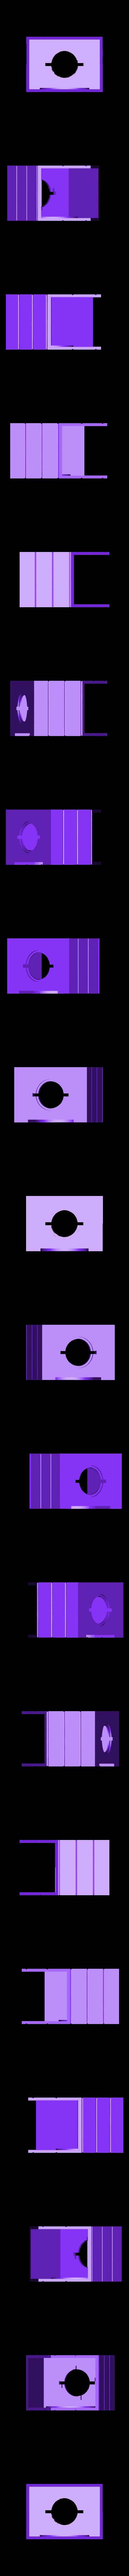 Snoopy_house_base_v1.stl Download free STL file Snoopy vs Red Baron Bank (Compilation/remix) • 3D print template, lowboydrvr